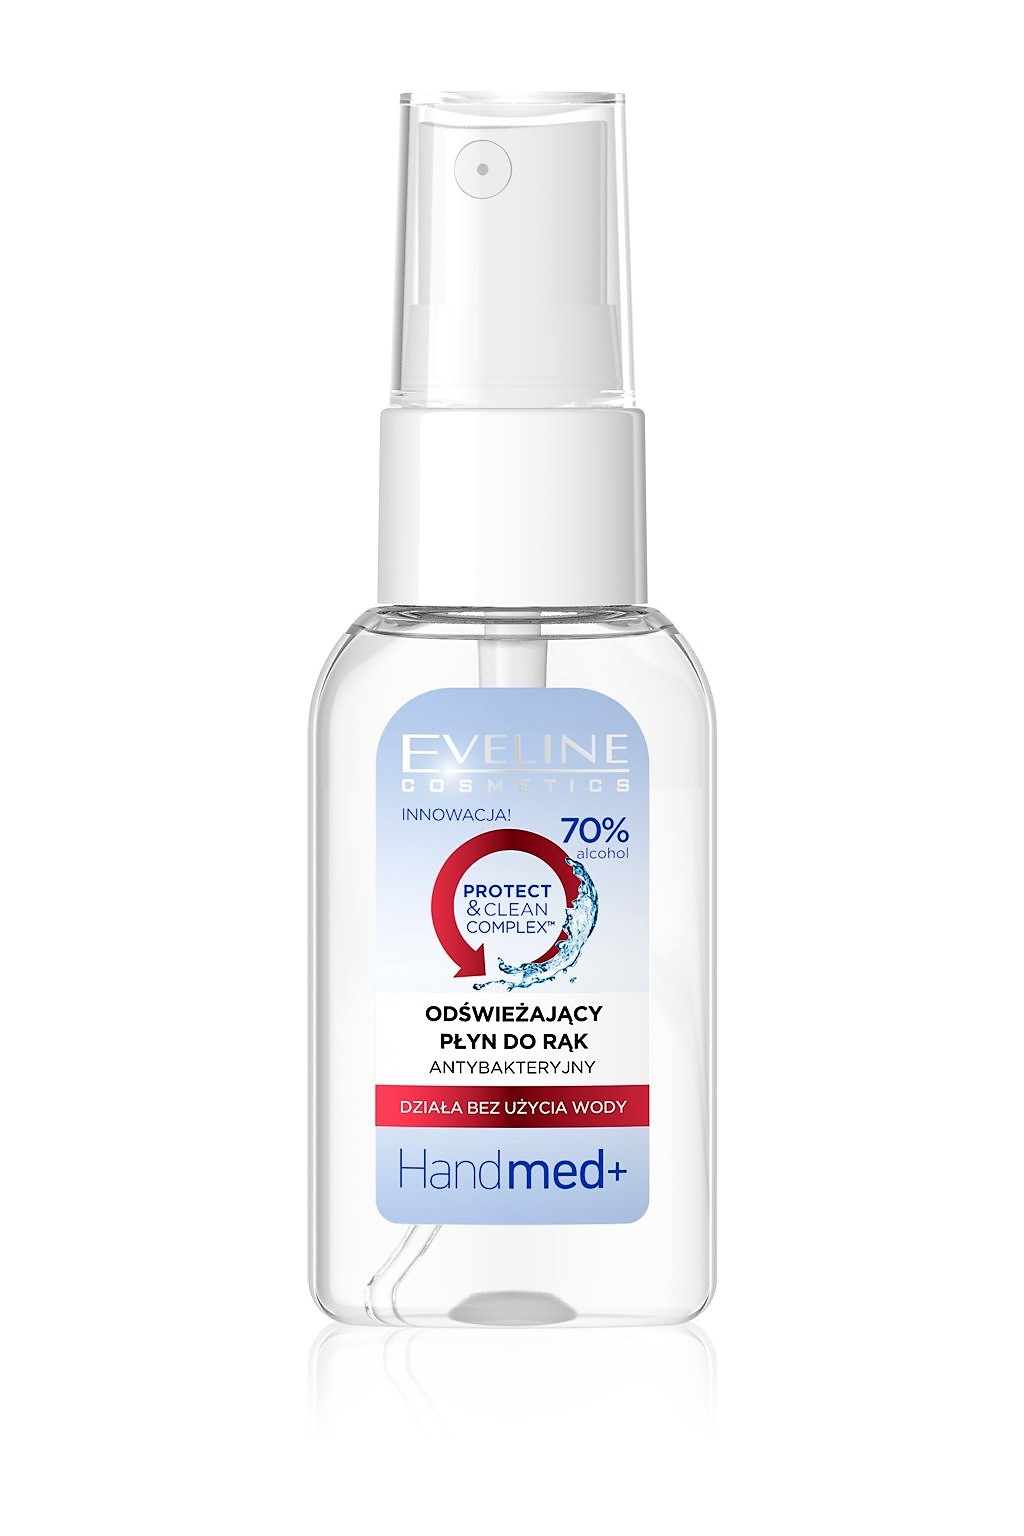 Eveline cosmetics Handmed+ Antibakteriální sprej na ruce 30 ml